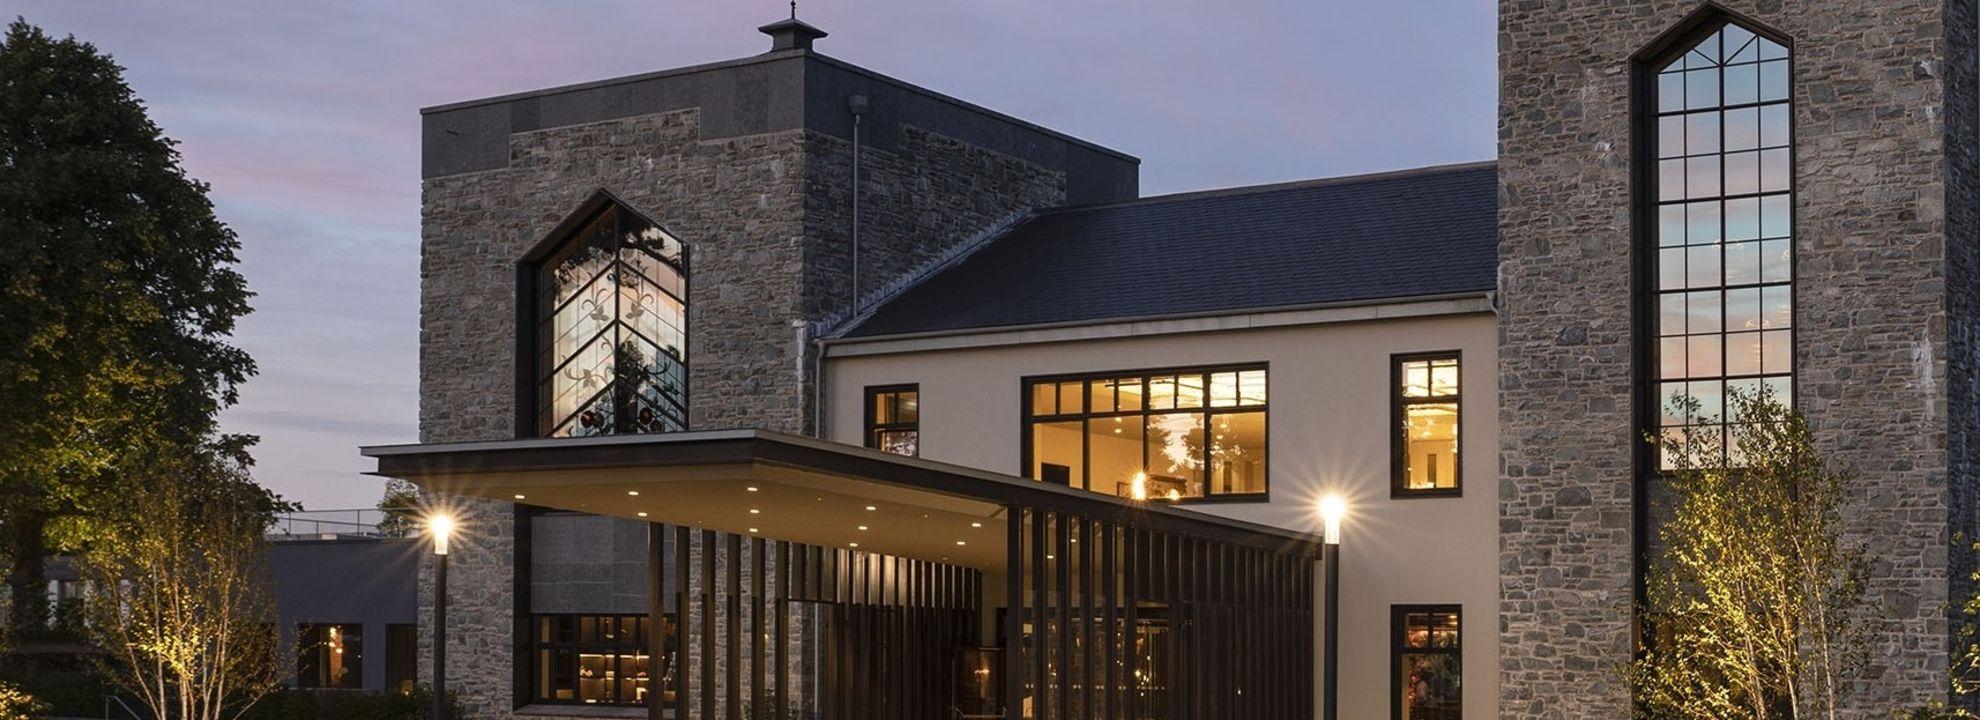 5 Star Retreat Luxury Hotel In Kerry Ireland The Dunloe